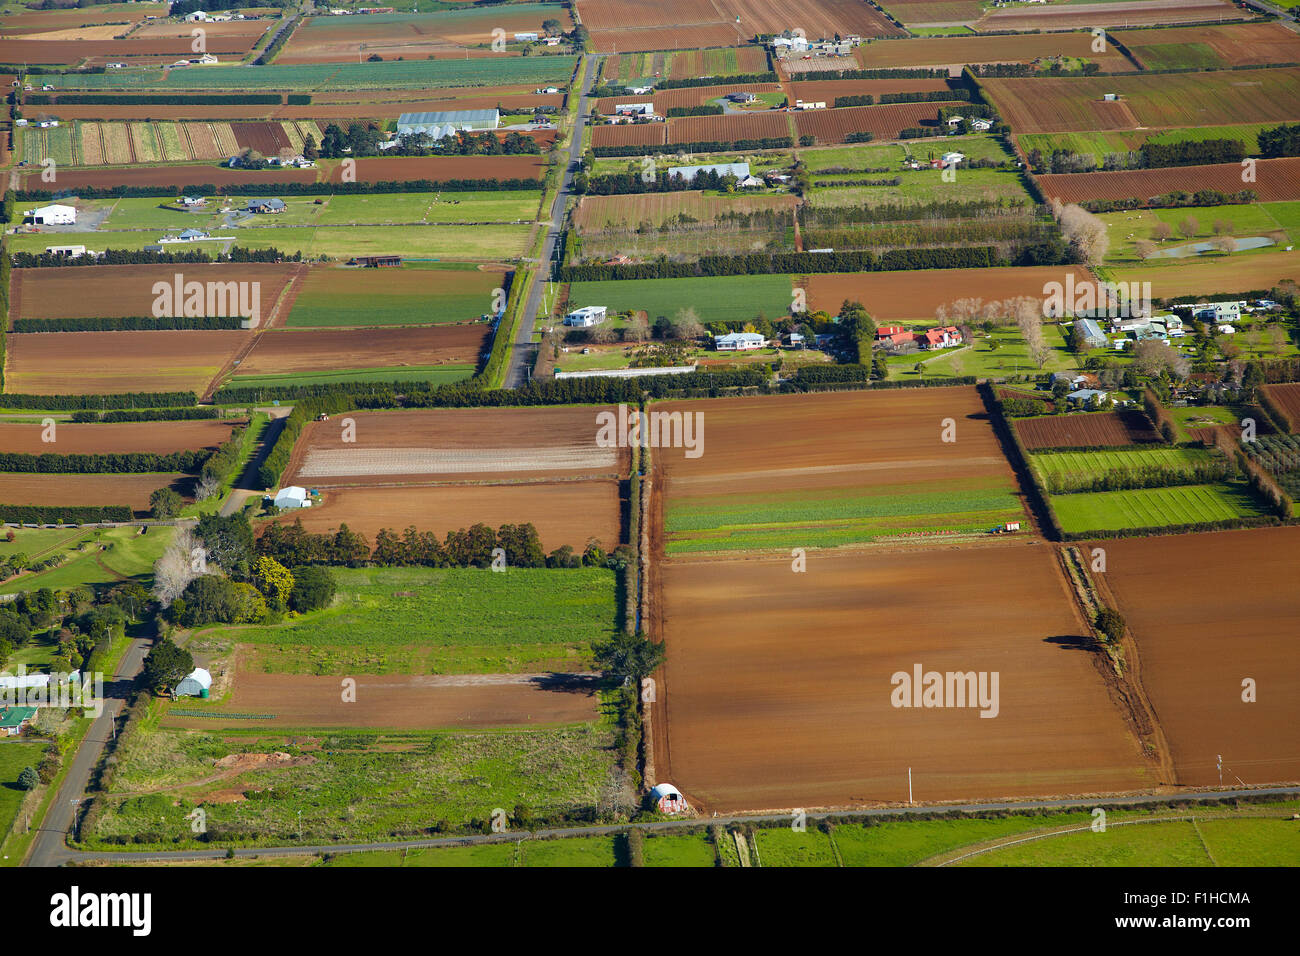 Vegetable Garden Aerial Stock Photos & Vegetable Garden Aerial Stock ...